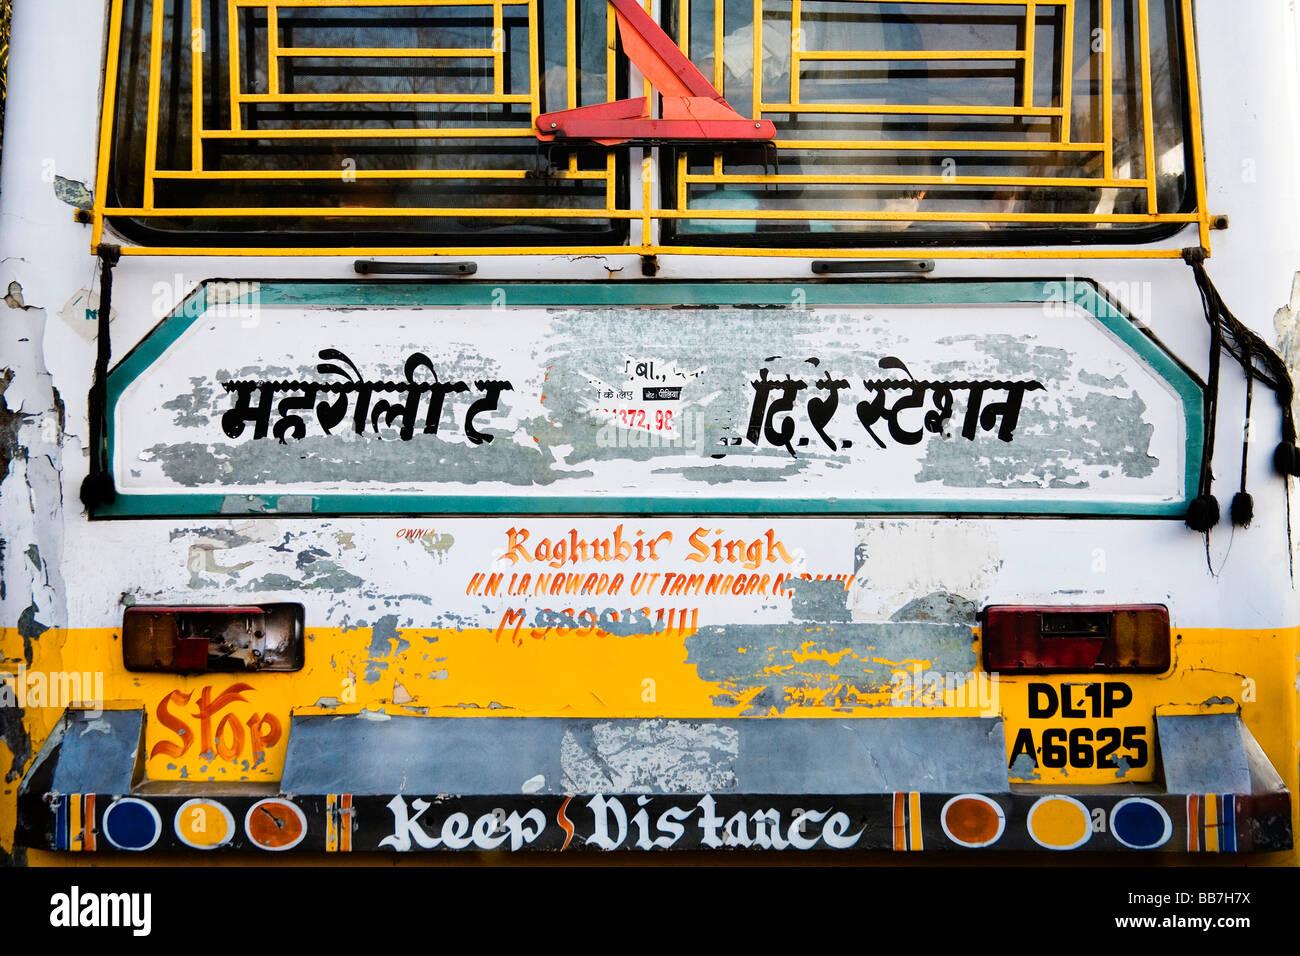 Indian bus, North India, India, Asia Stock Photo